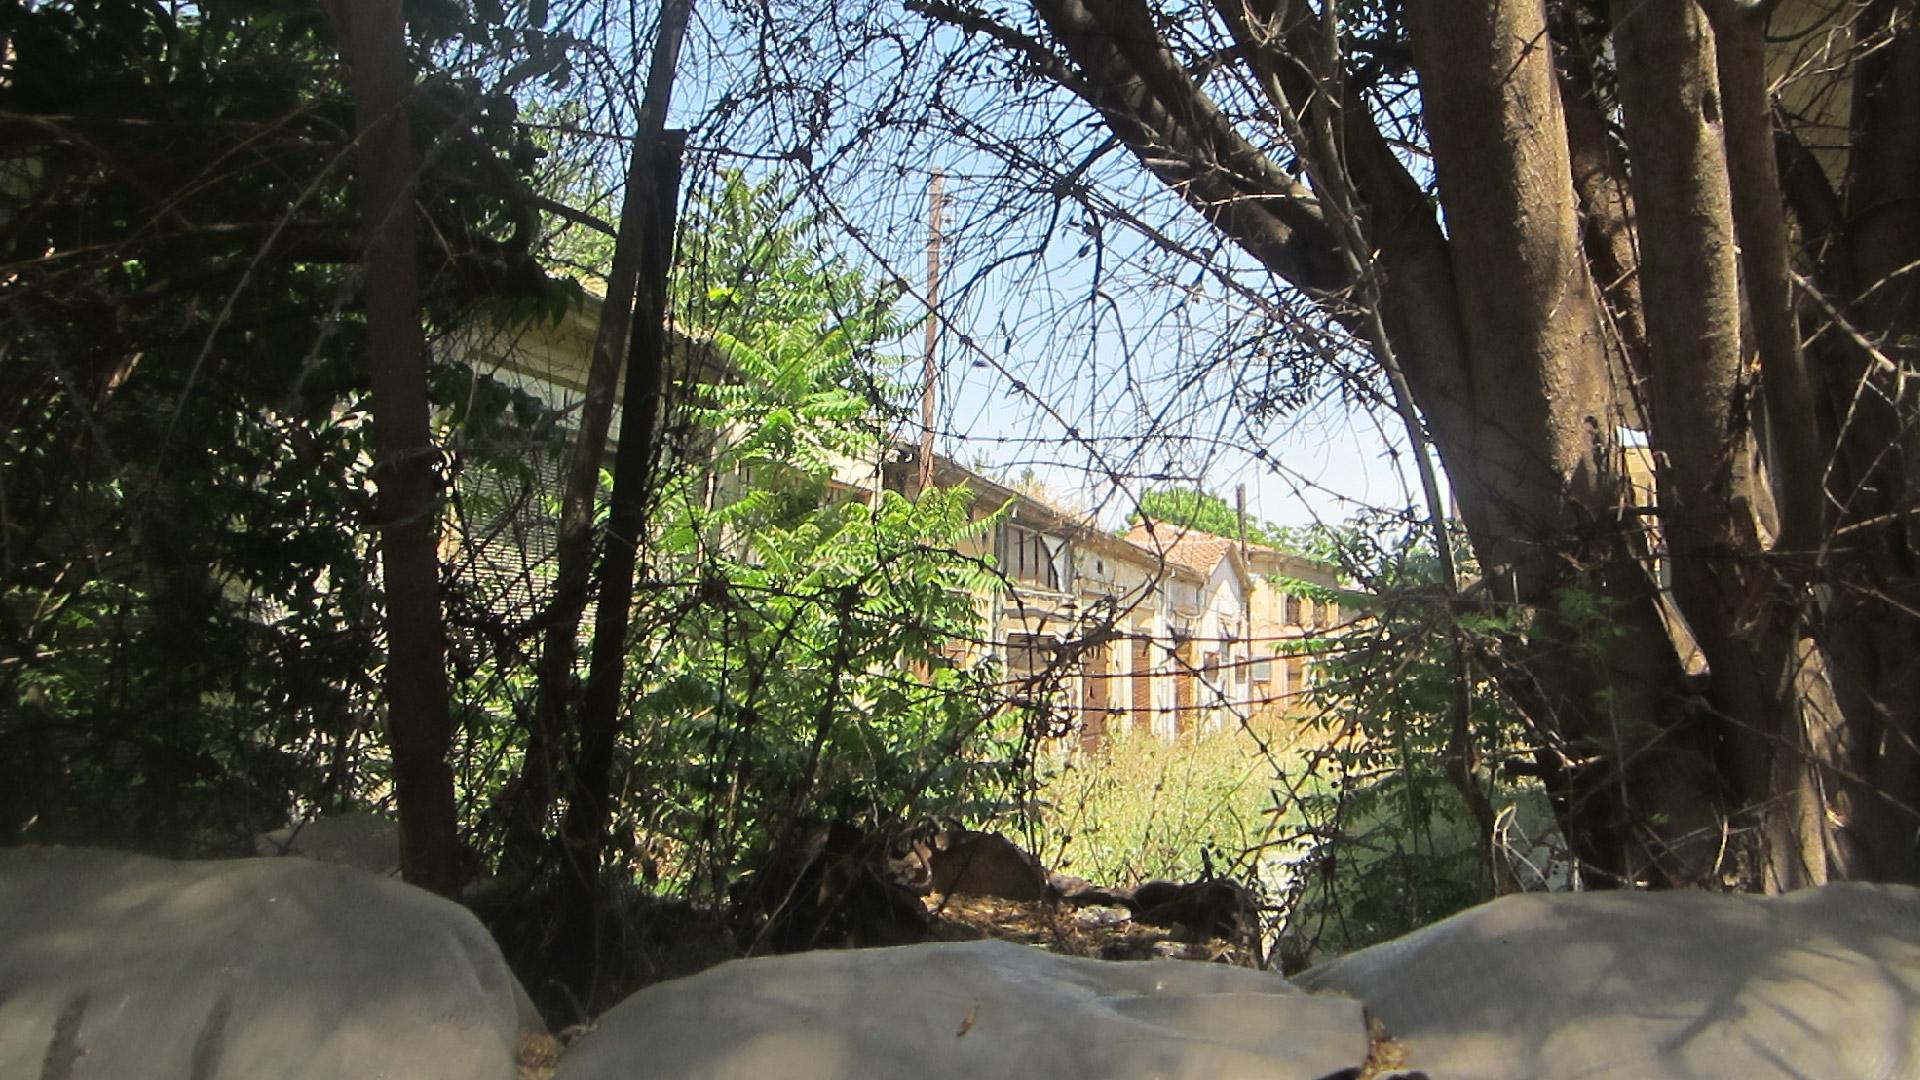 KC_2_Buffer zone Nicosia_Konstantina Chrysostomou